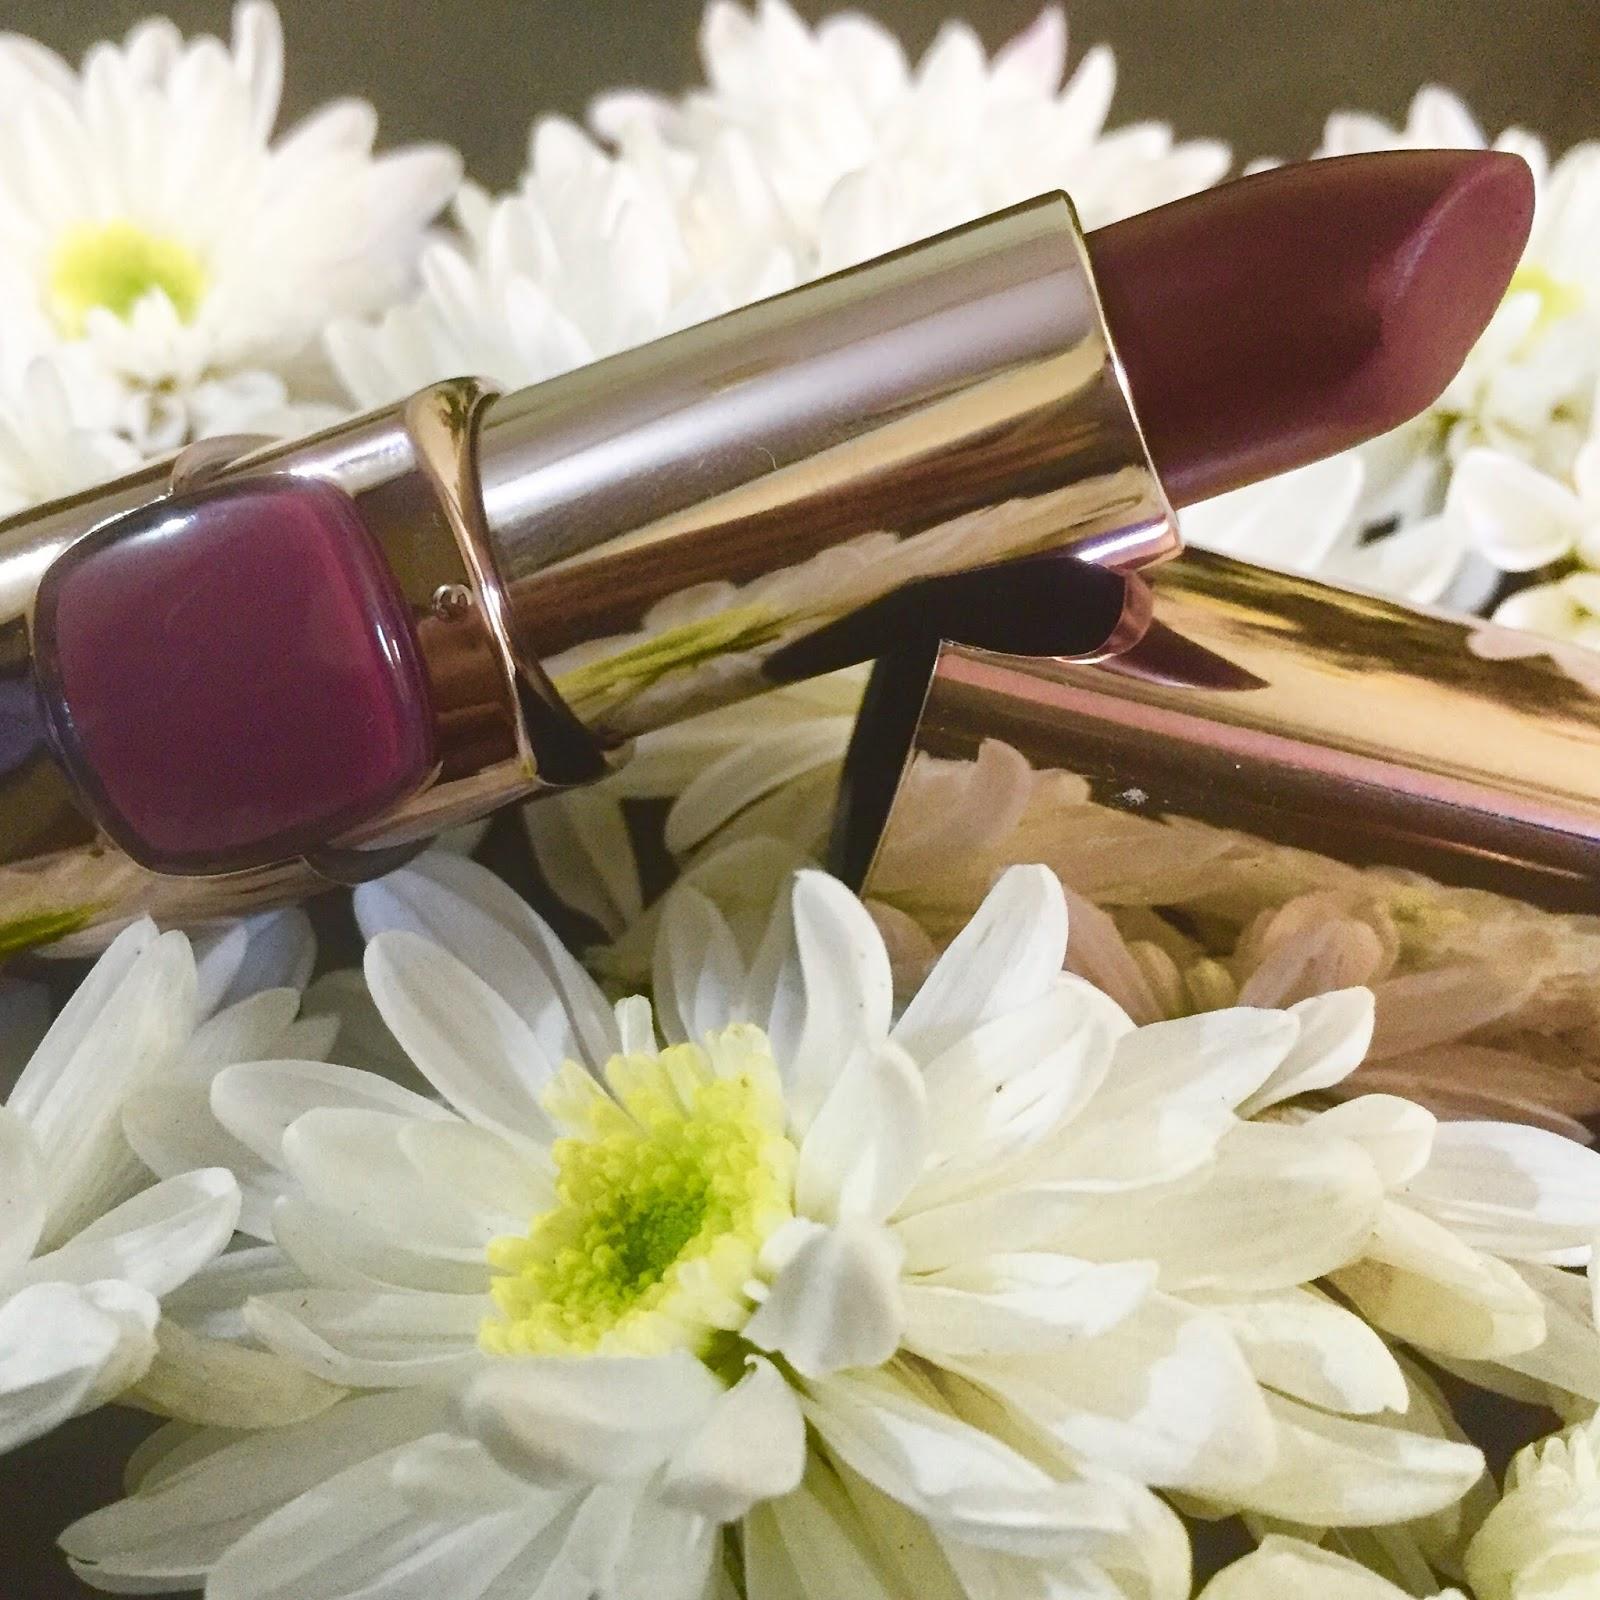 lipstick with flower inside